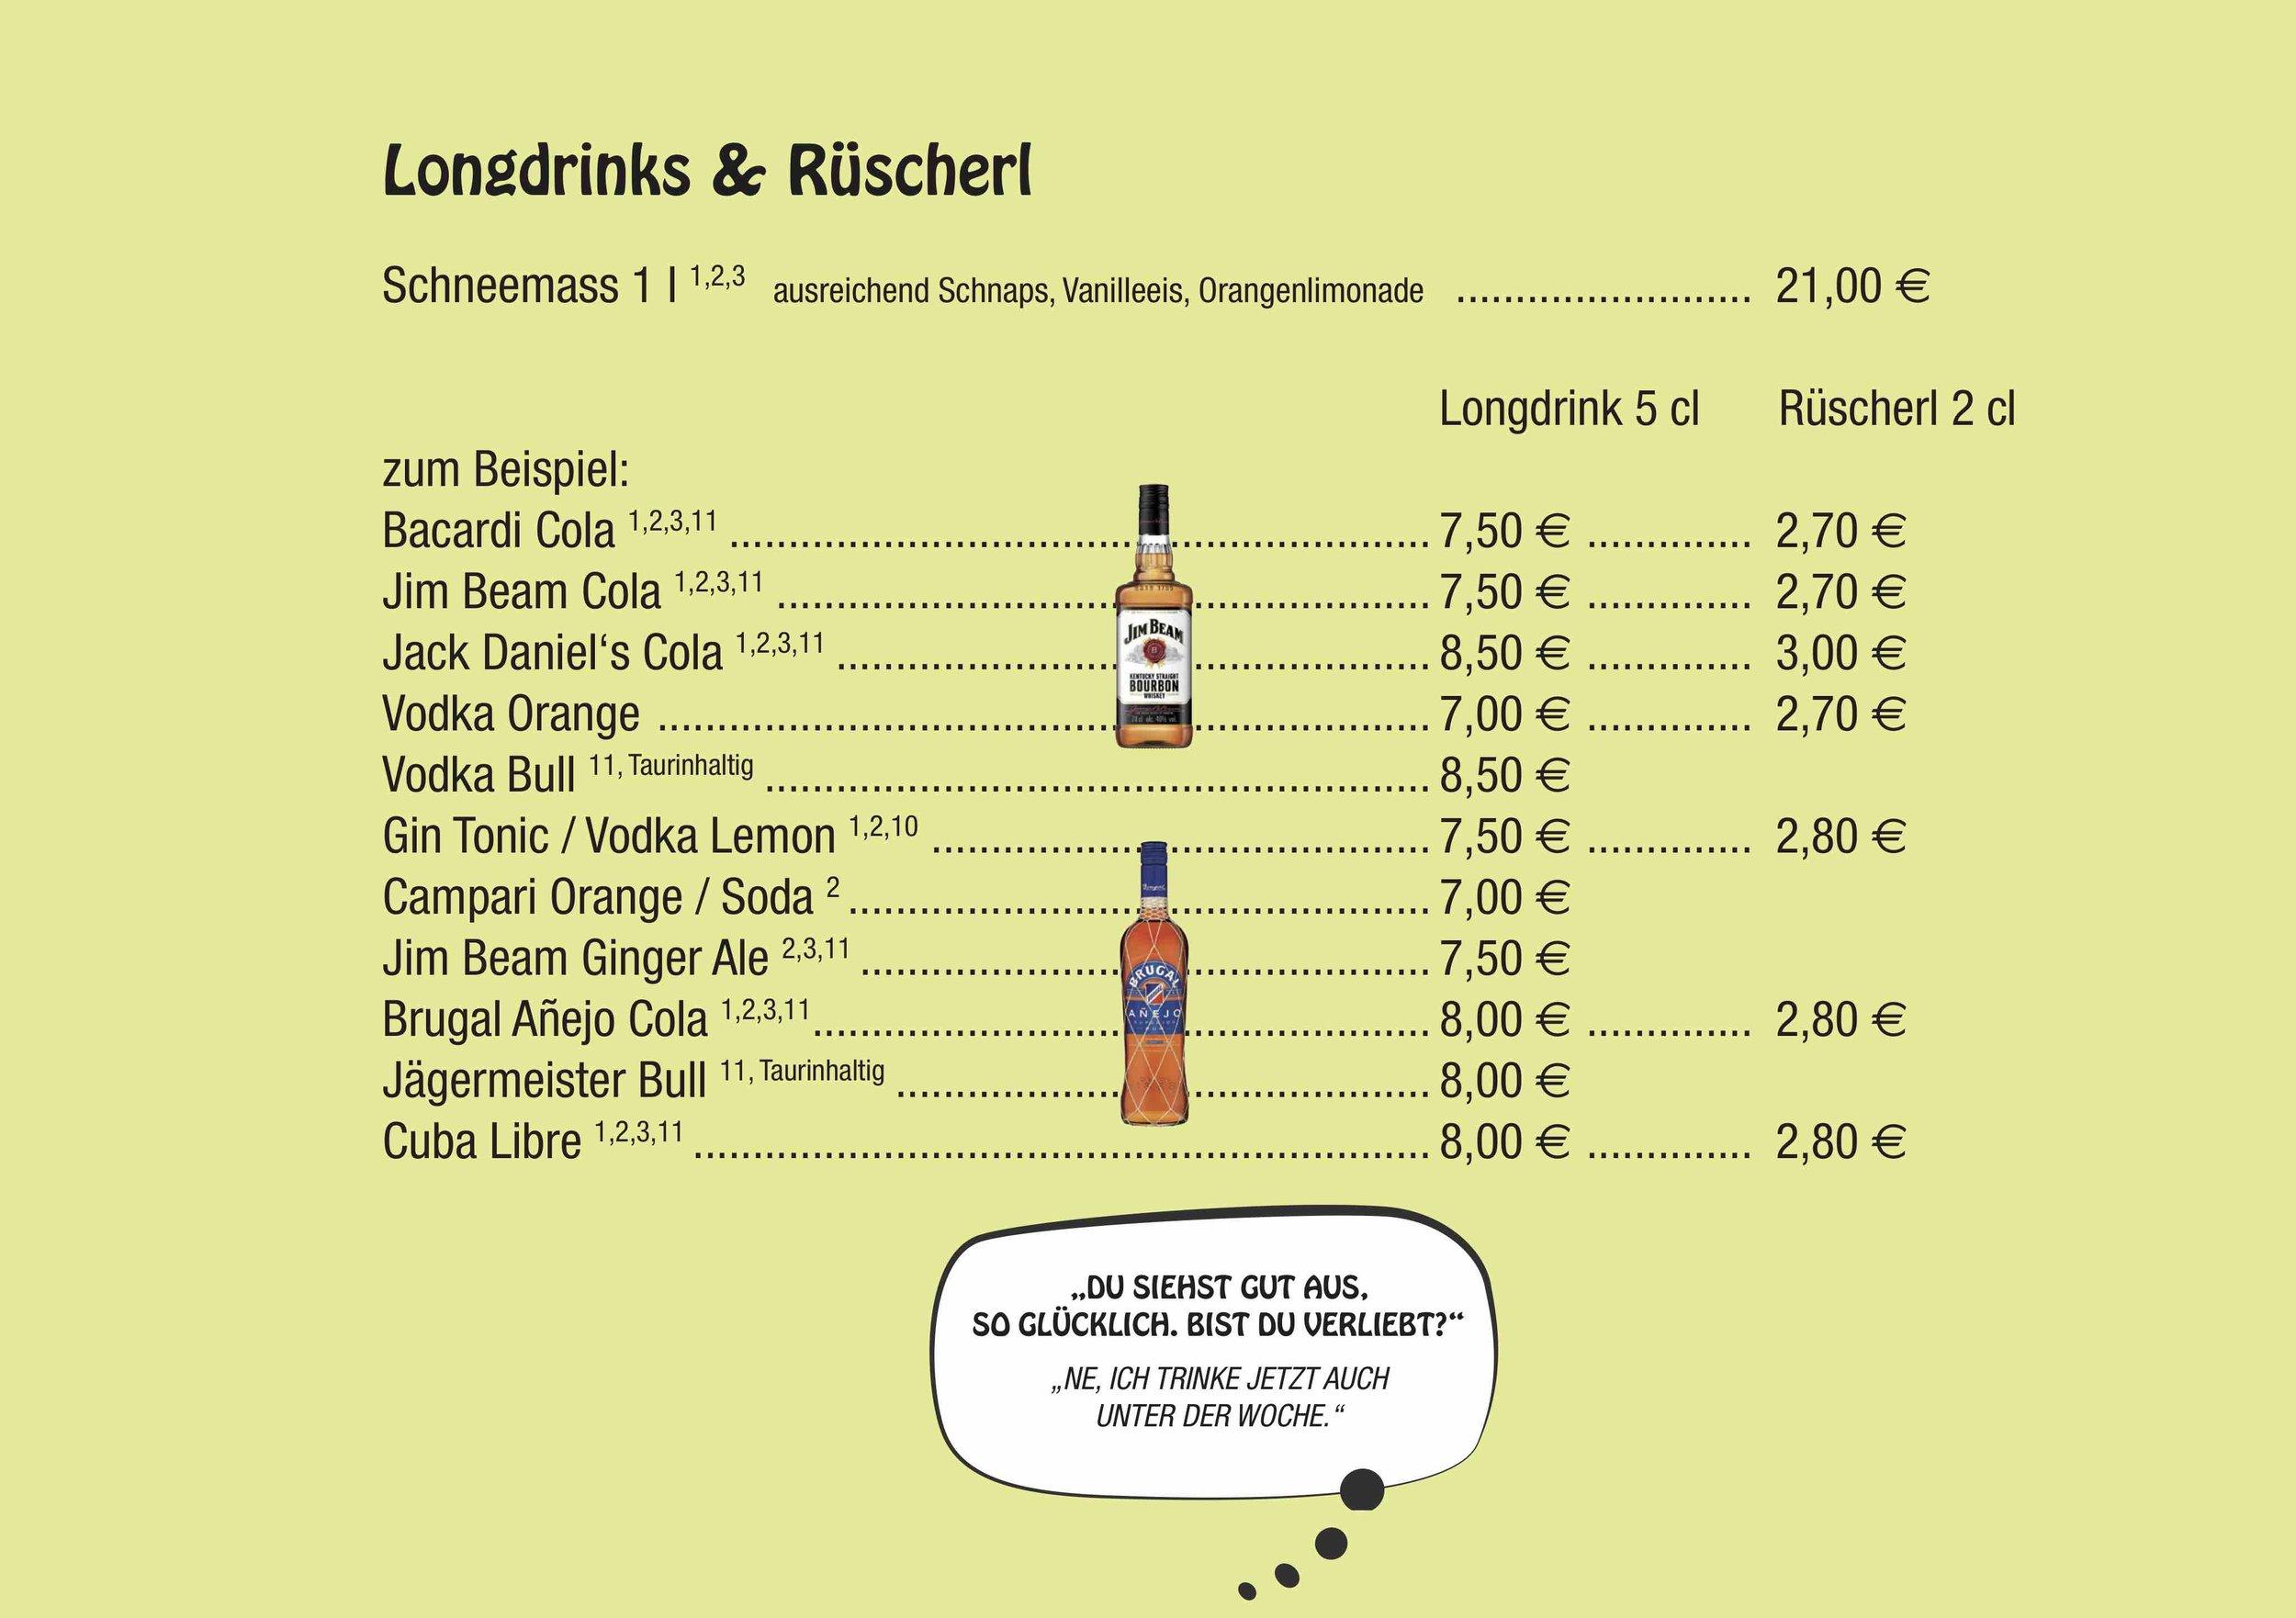 Kesselhaus_Bad_Tölz_Speisekarte_Longdrinks_und_Rüscherl.jpg